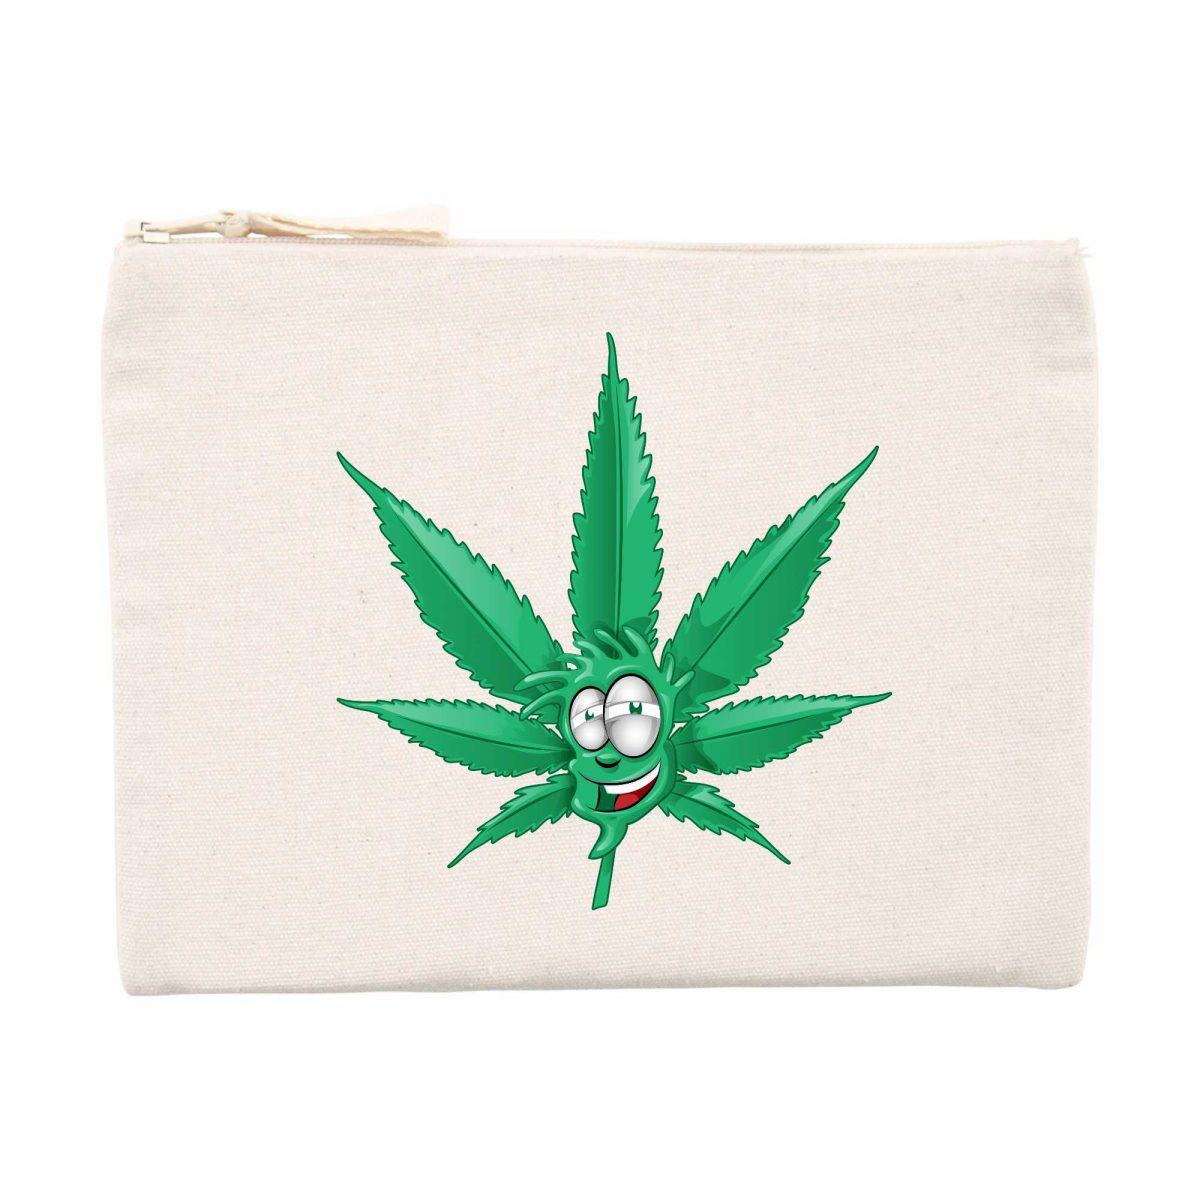 Pochette Made In Chanvre - Feuille de Cannabis